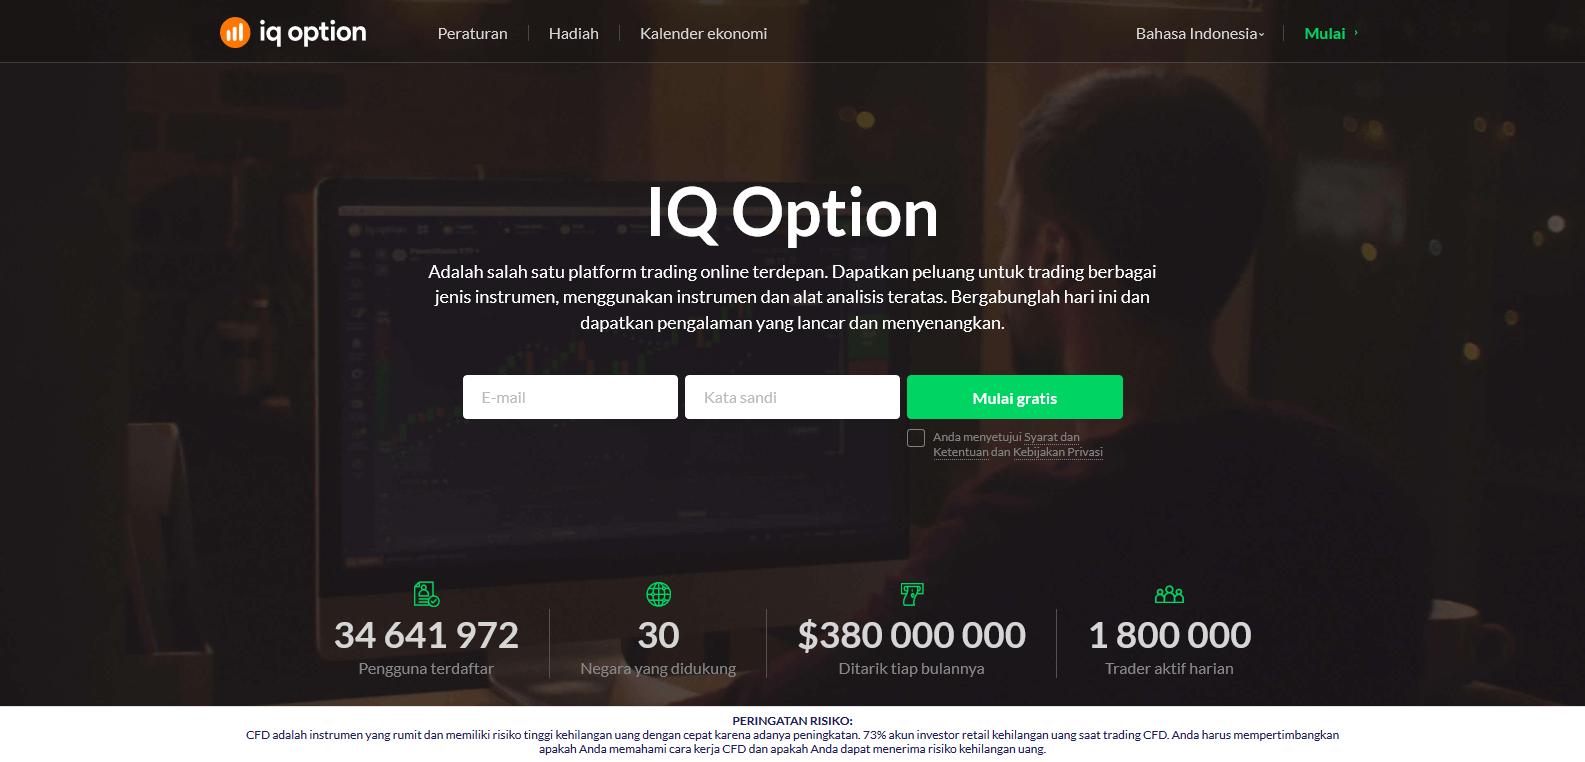 IQ option indonesia homepage